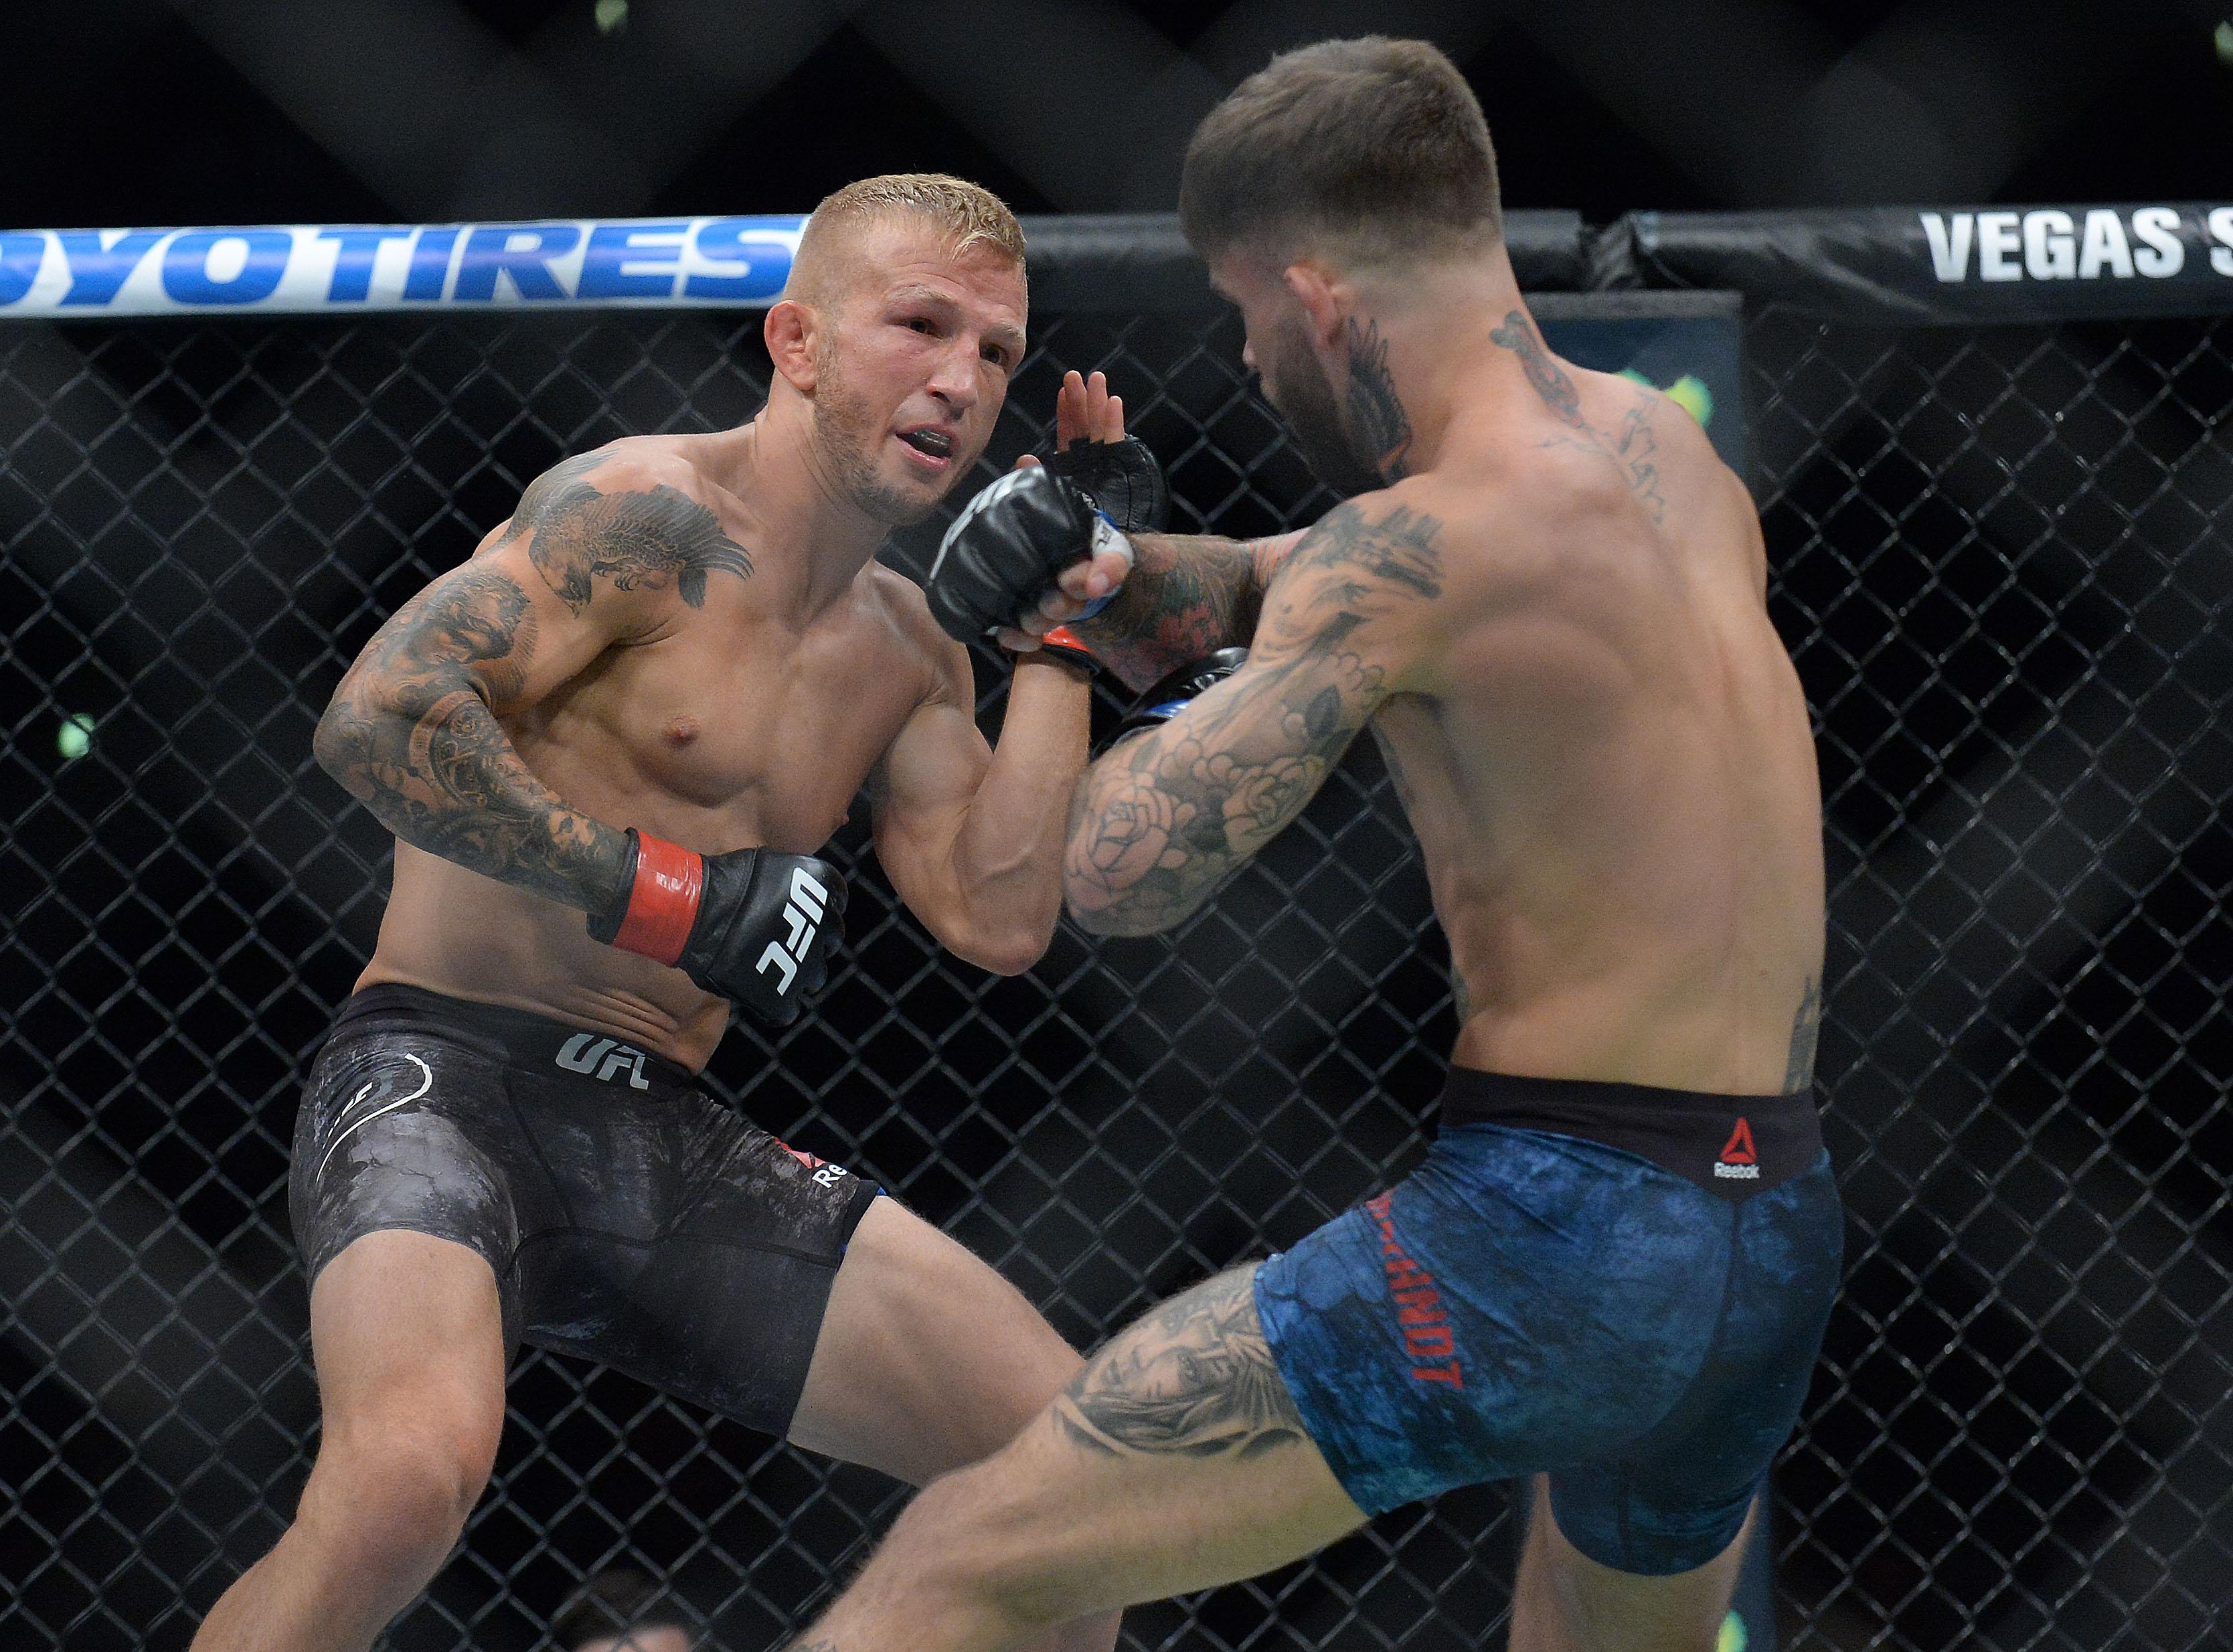 MMA: UFC 227-Dillashaw vs Garbrandt